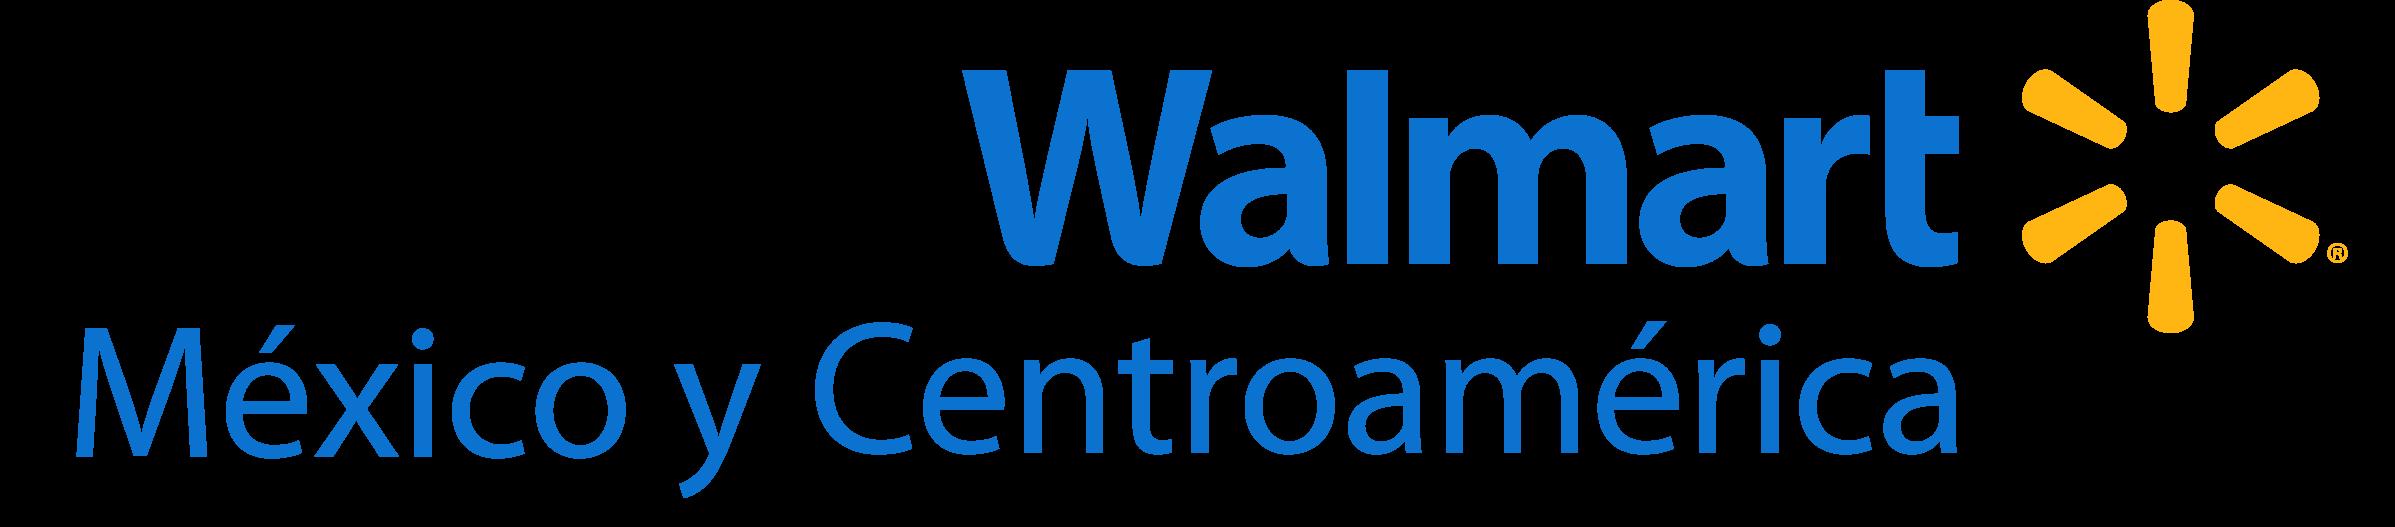 Wal*Mart México's logo